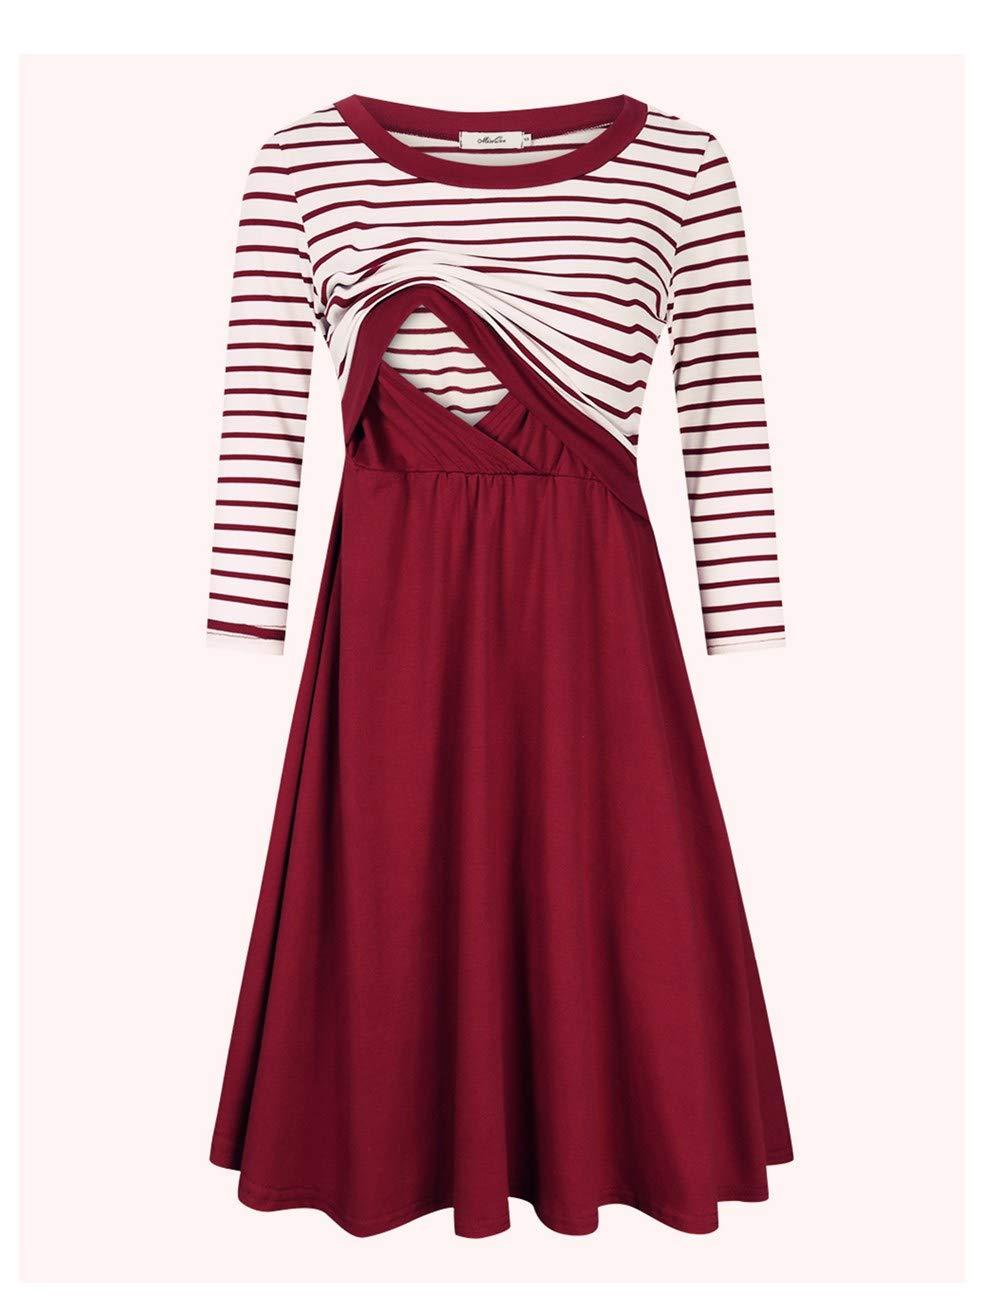 MissQee Maternity Dress Women's Stripe 3/4 Sleeve Nursing Dress for Breastfeeding Burgundy L